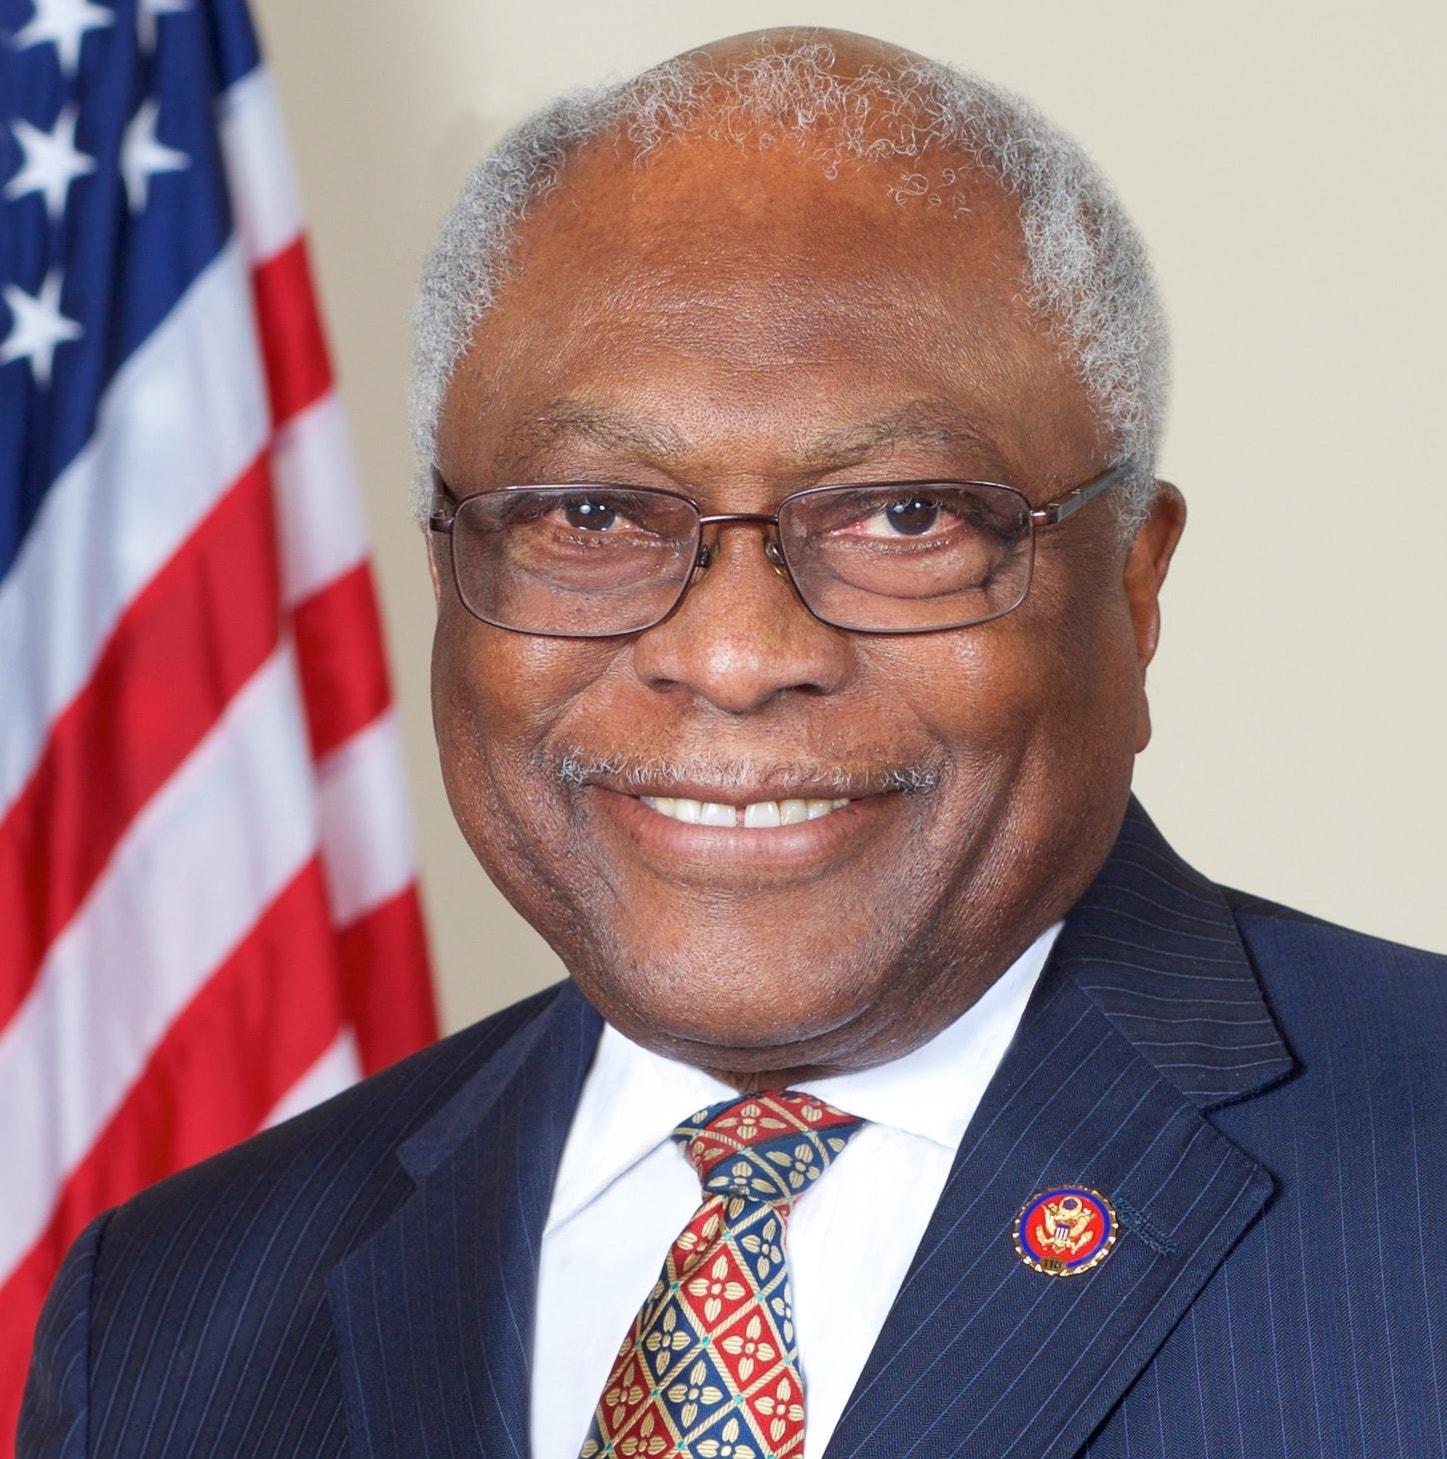 James E. Clyburn